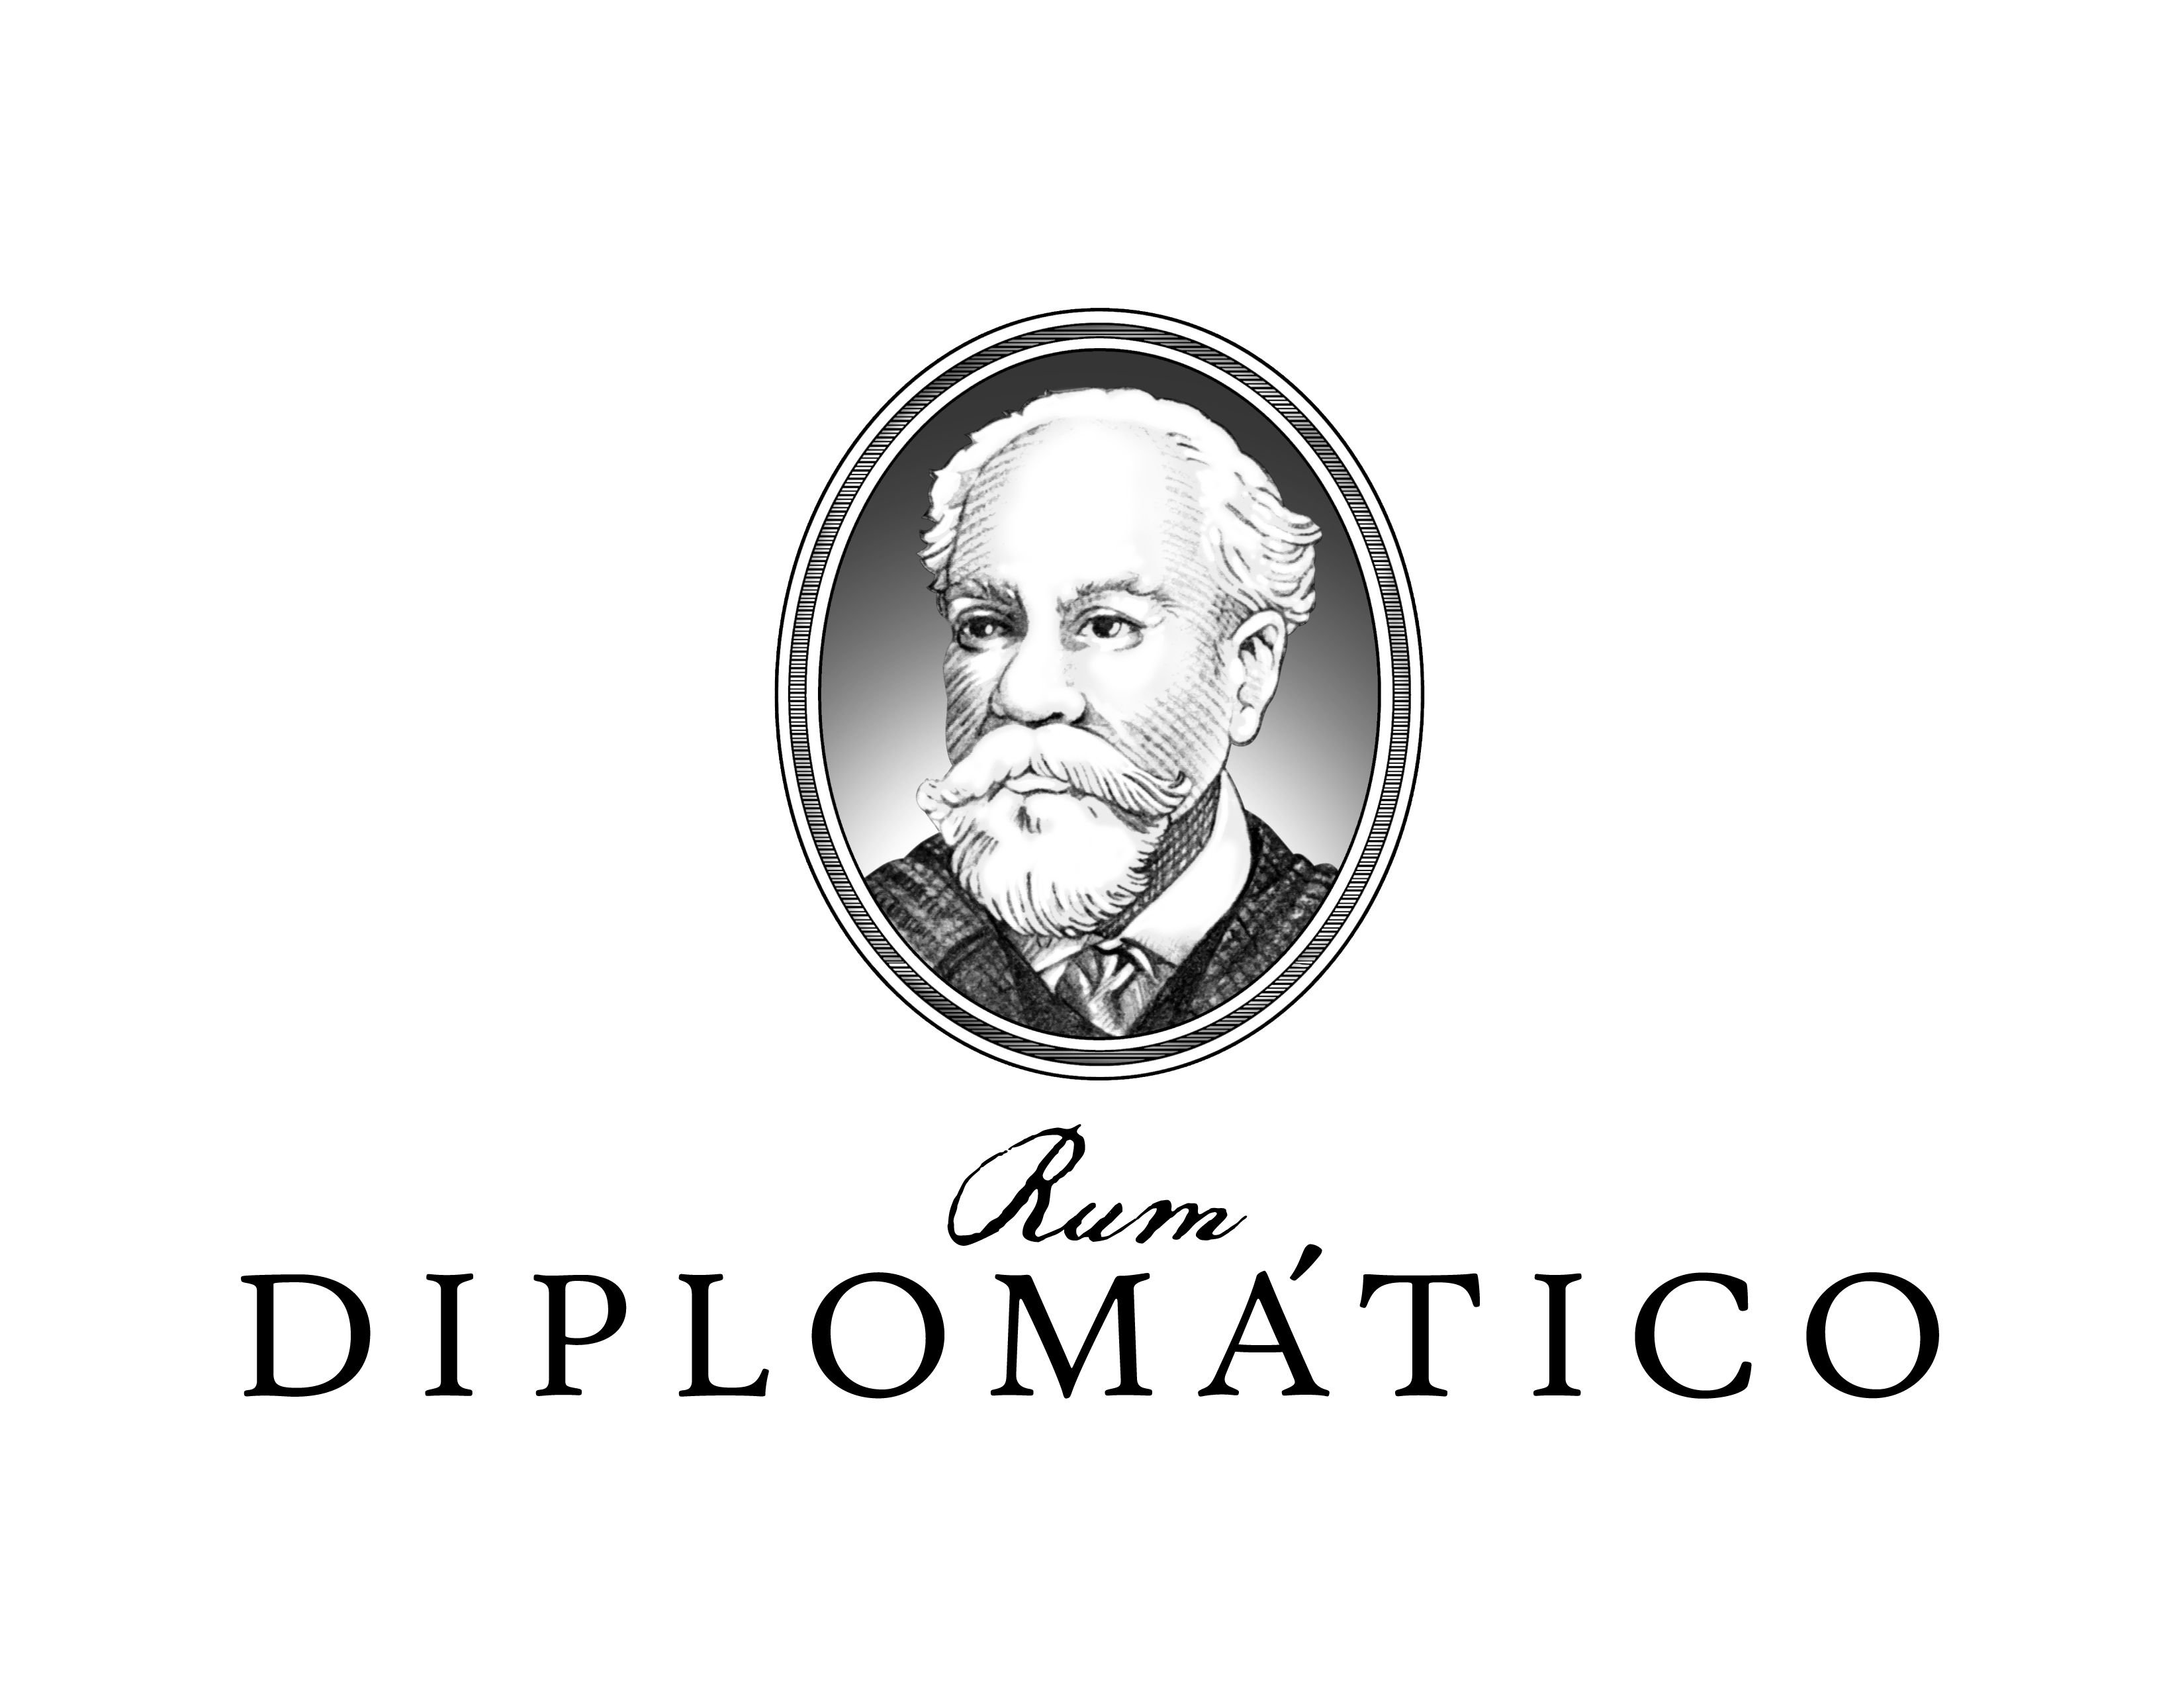 DiplomaticoLogo-web